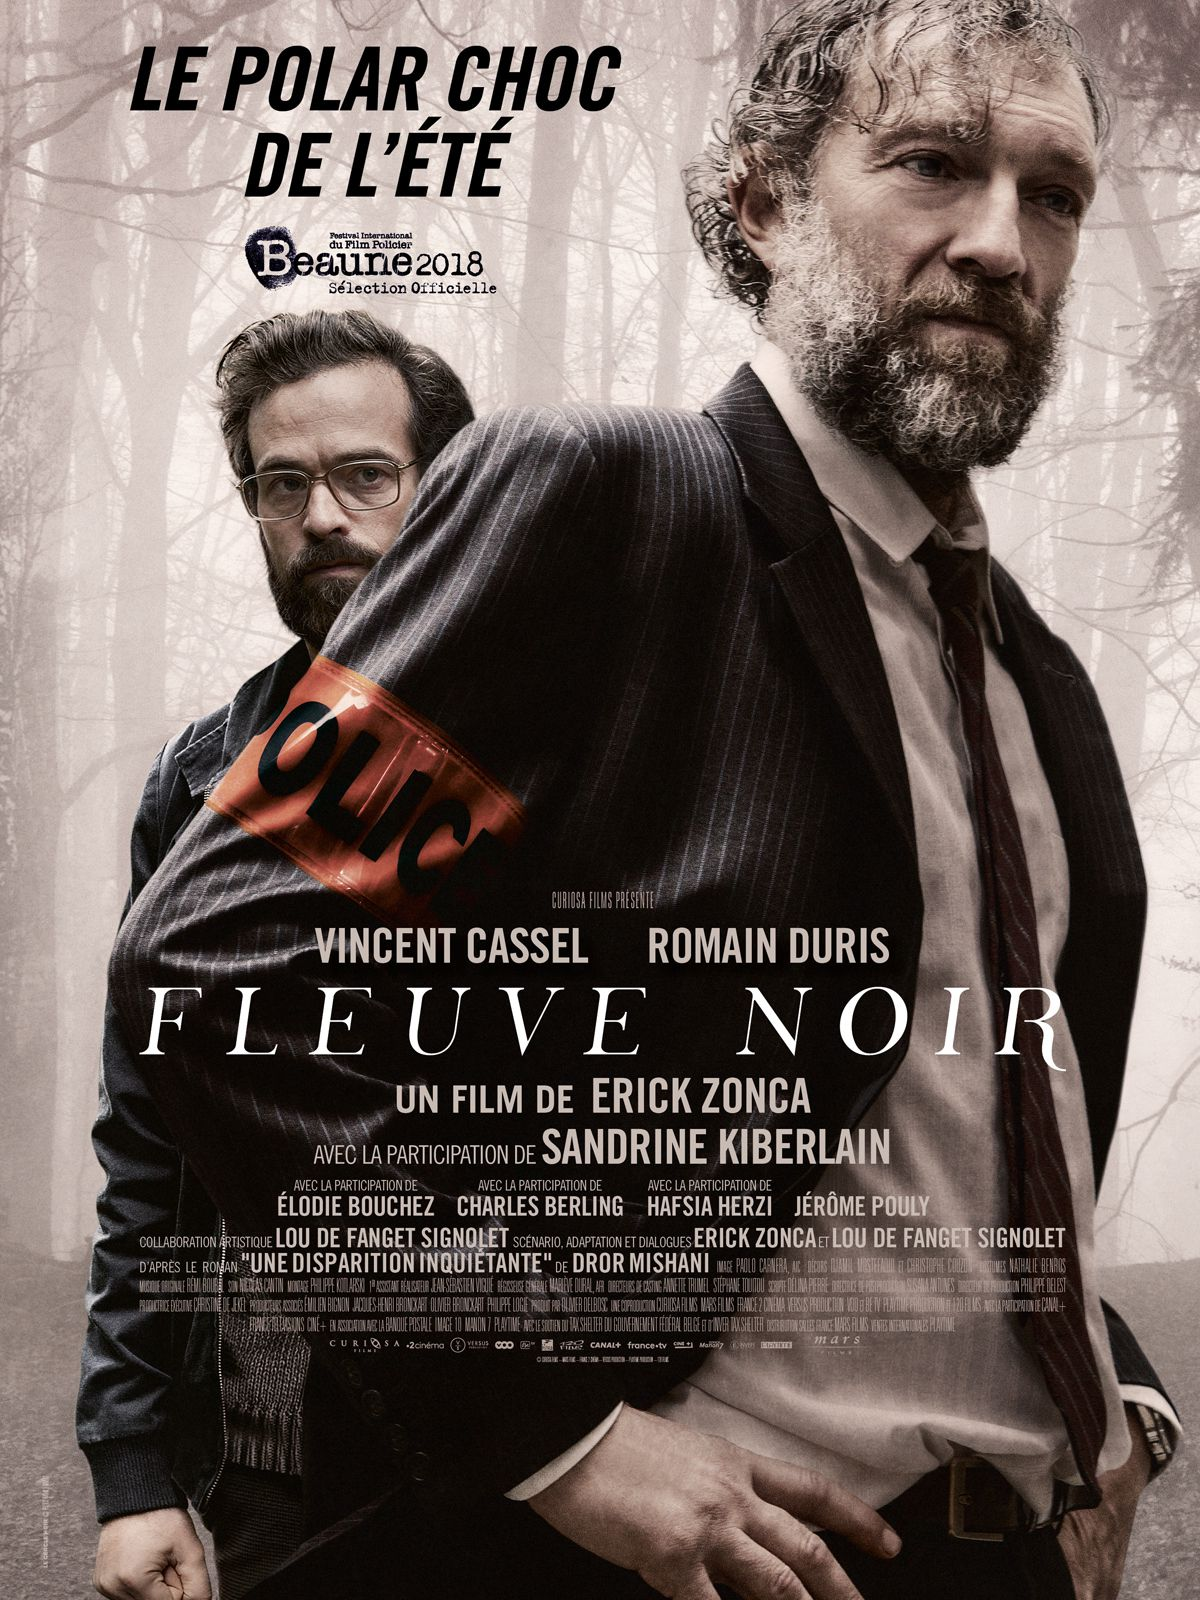 Fleuve noir - Film (2018)